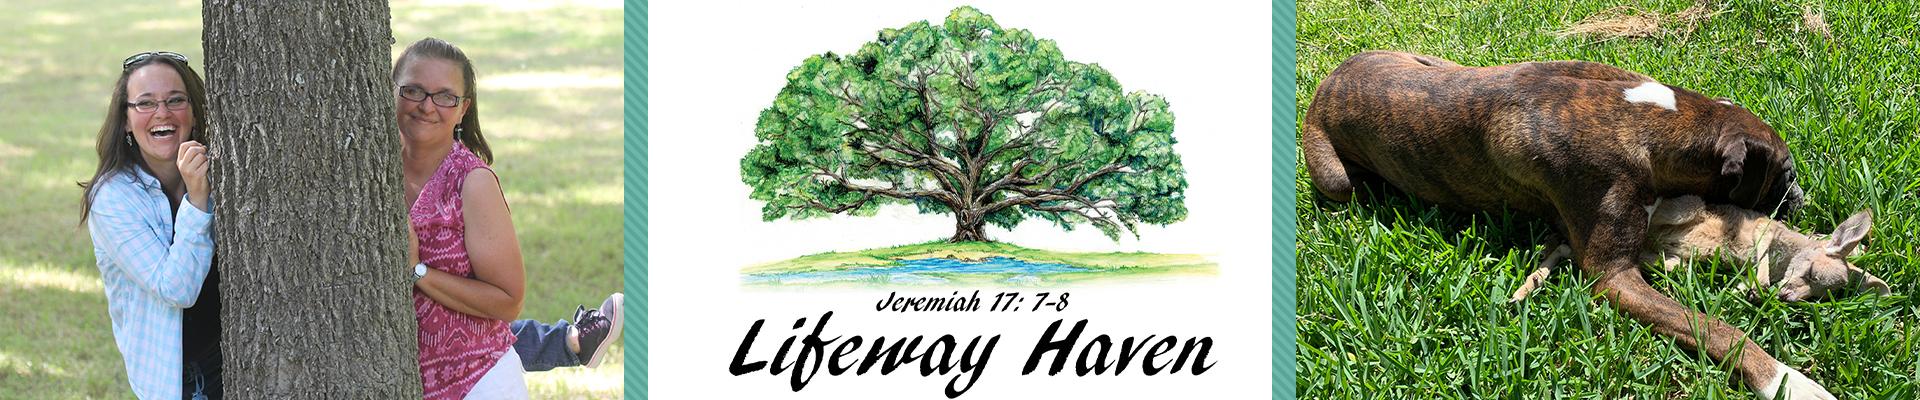 Lifeway Haven